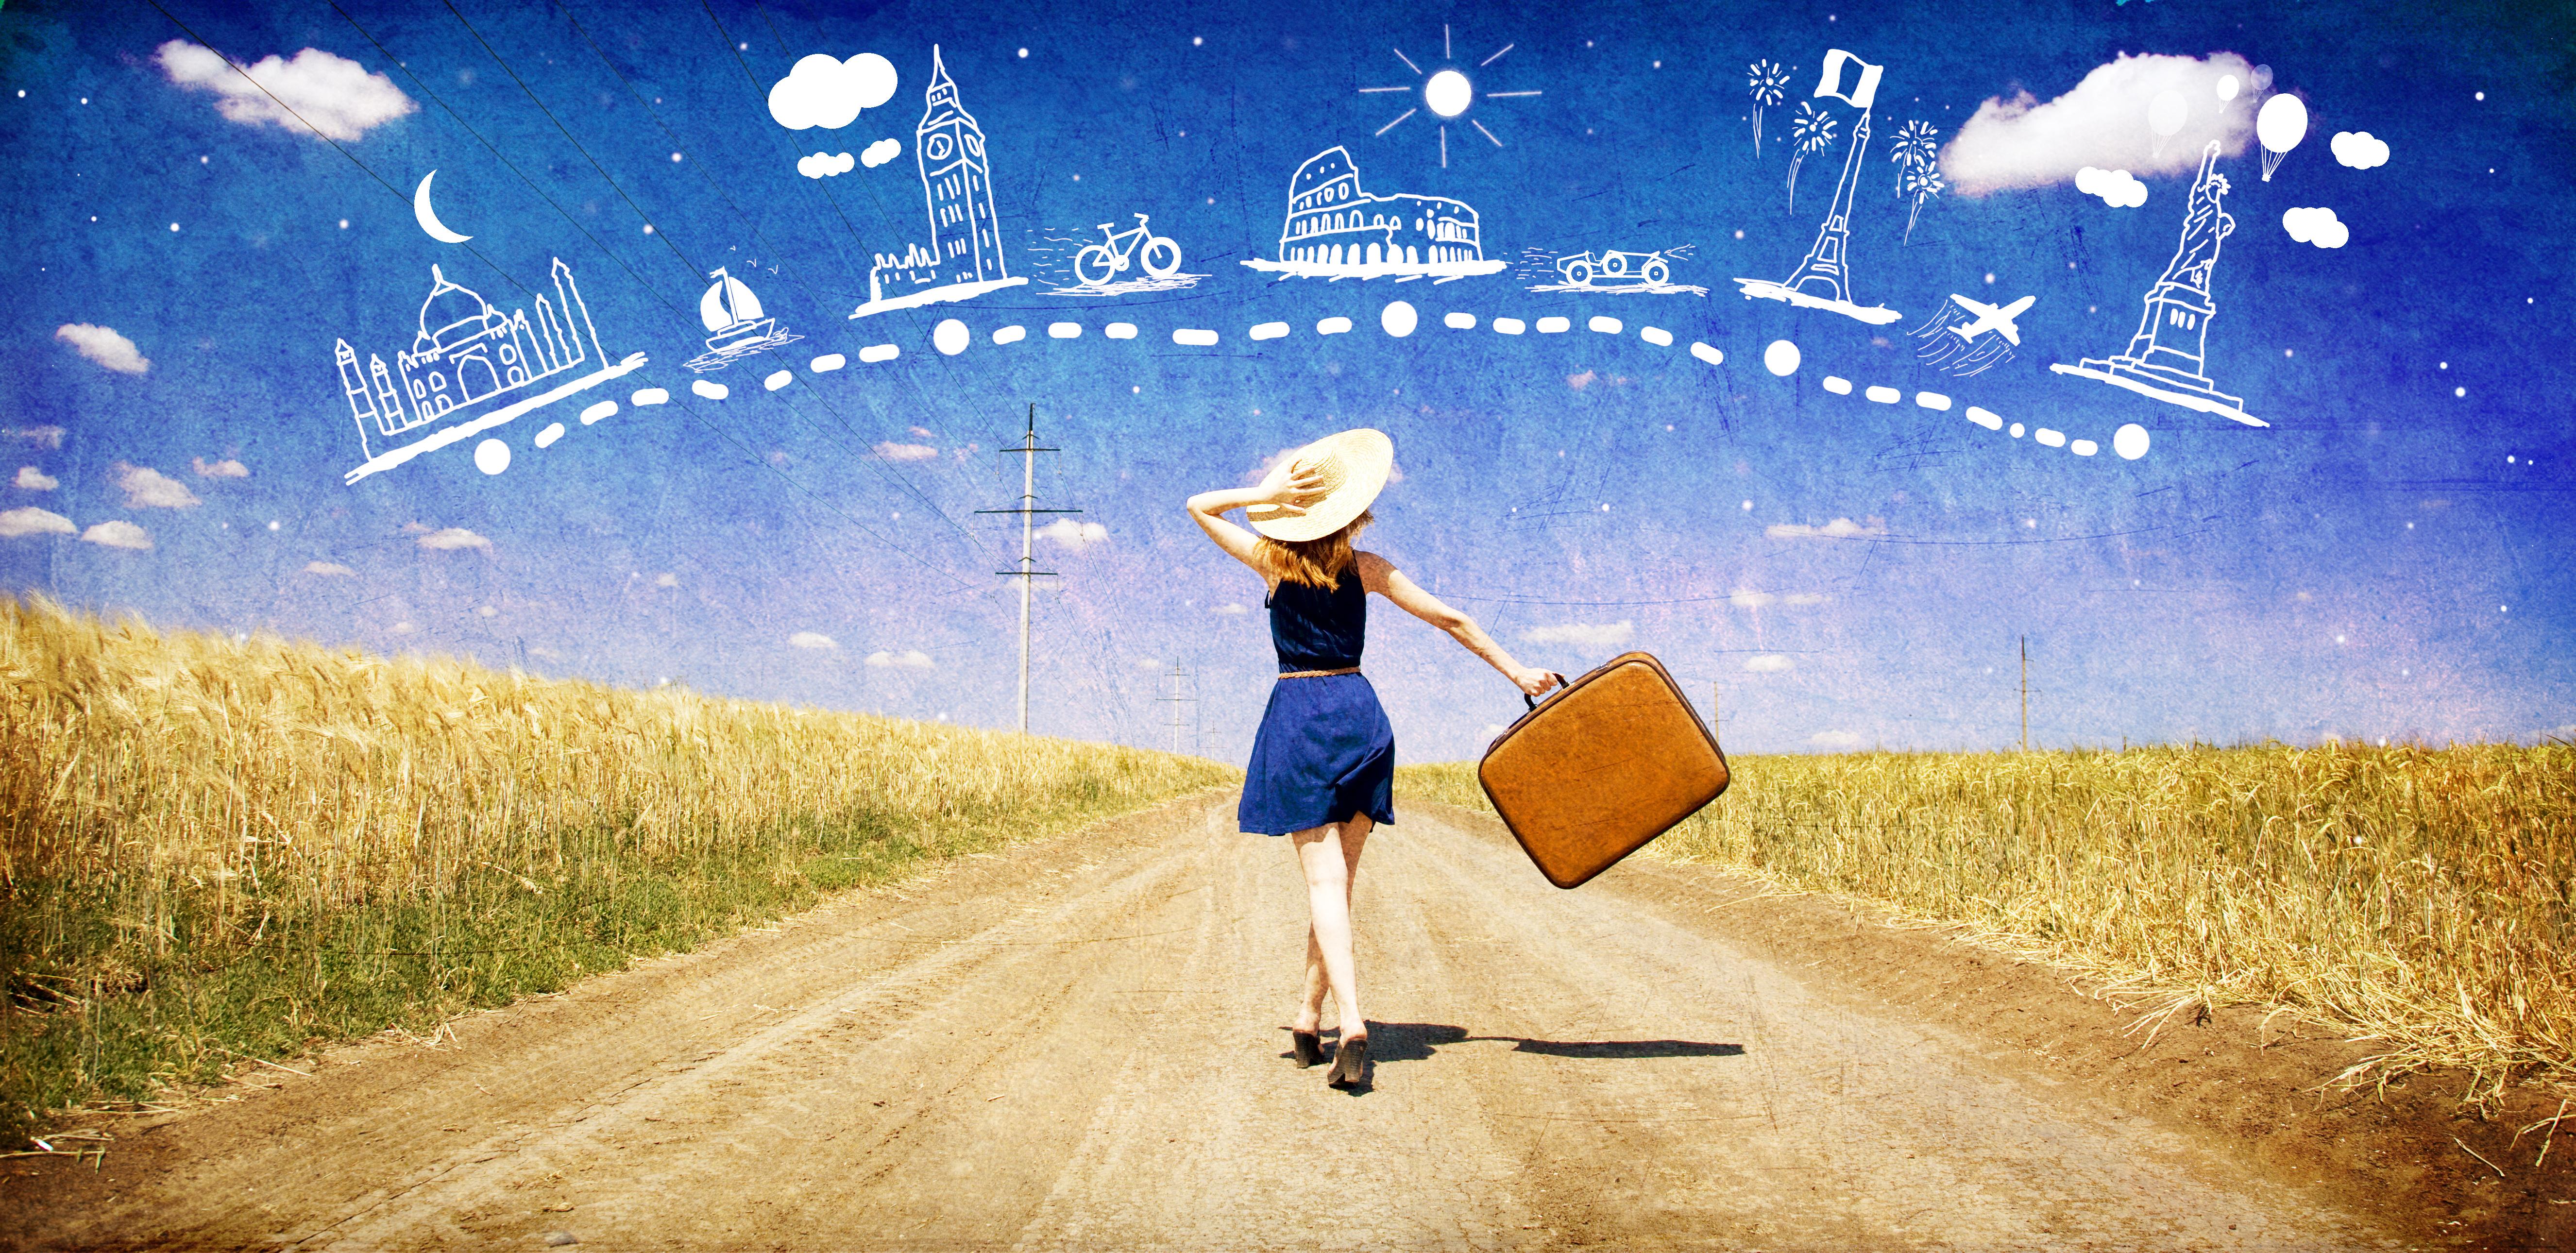 Travel Backgrounds, Compatible - PC, Mobile, Gadgets| 5304x2580 px